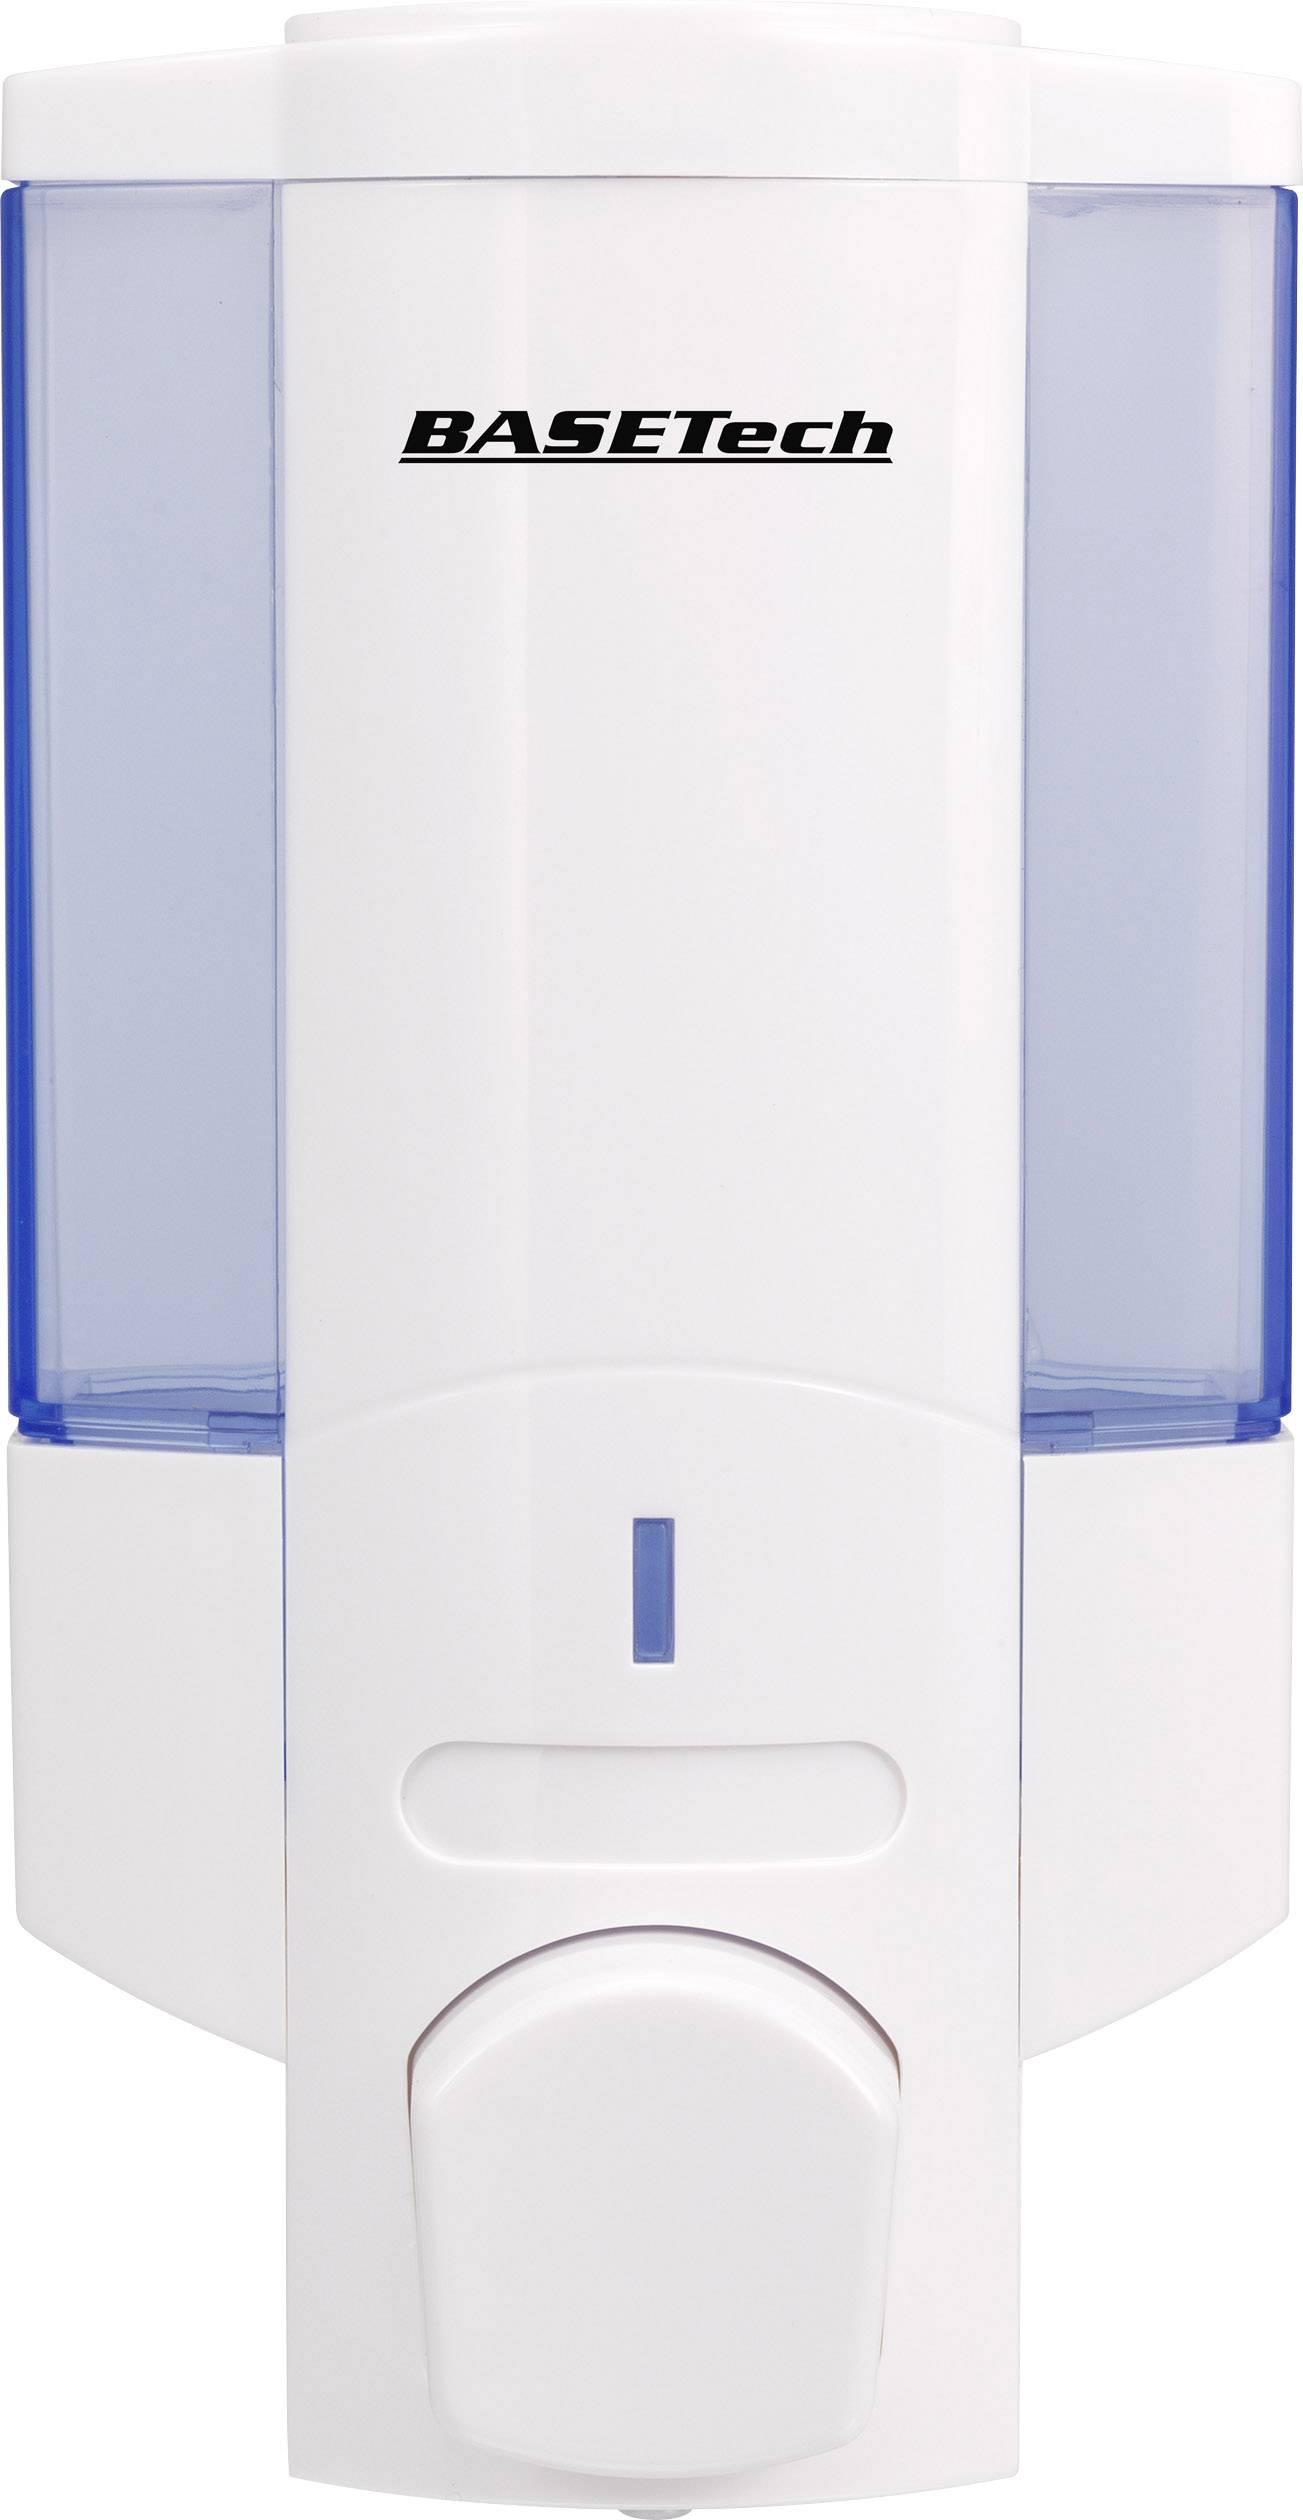 Dávkovač na tekuté mýdlo Basetech V-6101, 350 ml, bílá